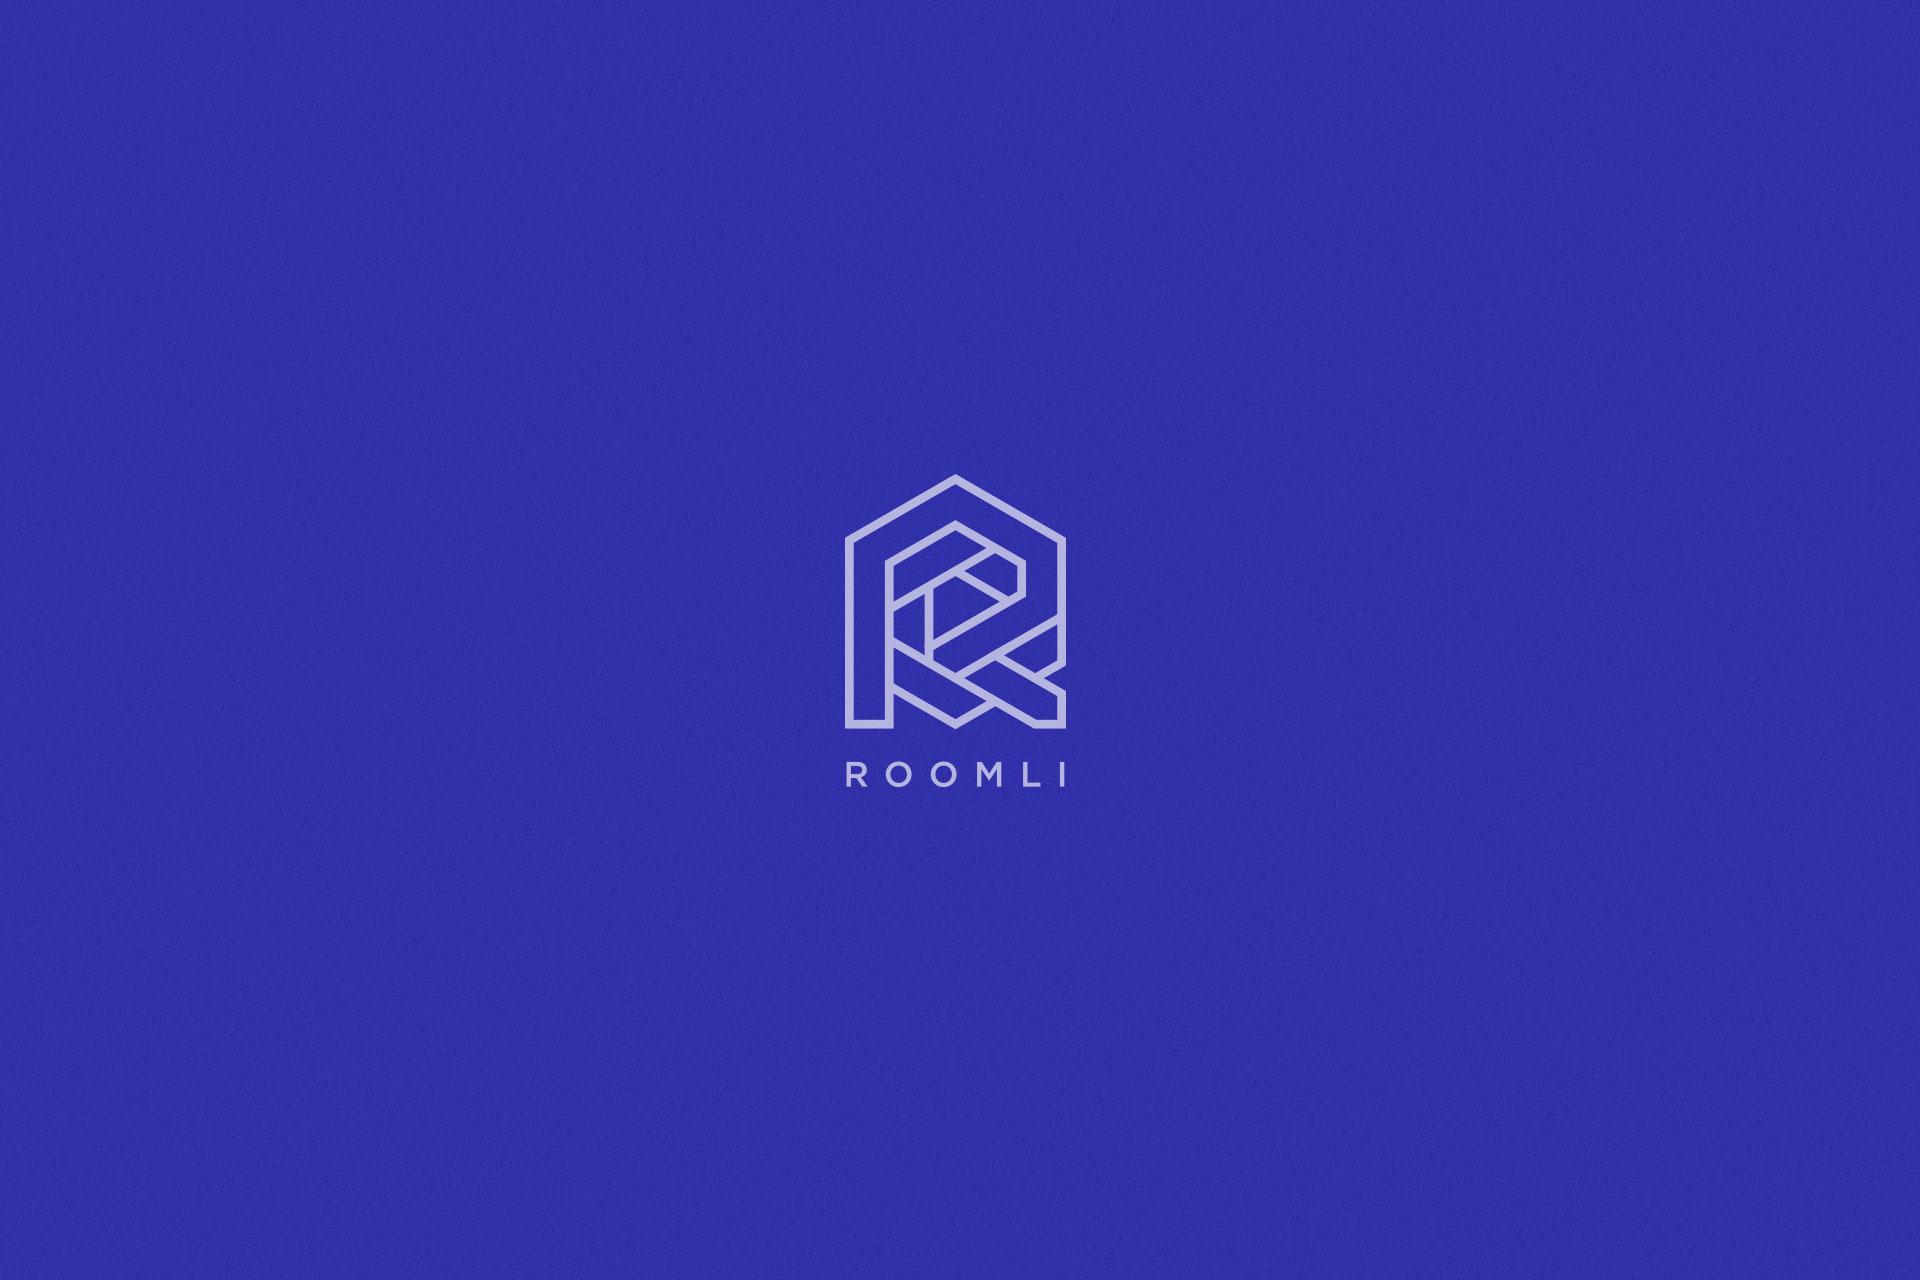 Logos & Brandmarks Roomli